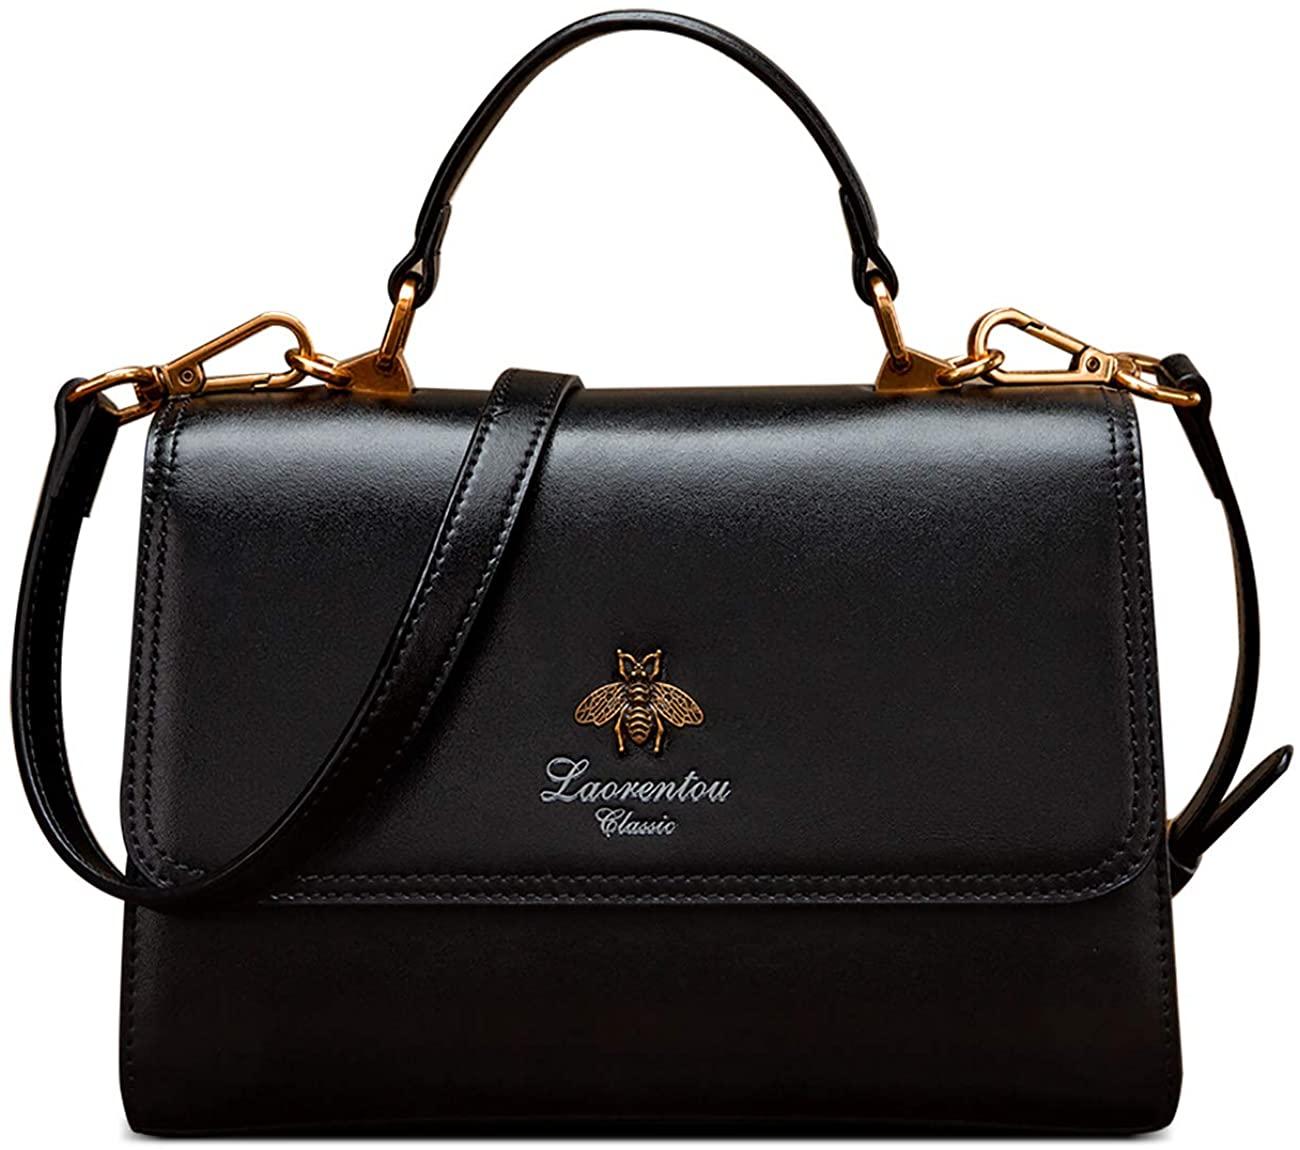 LAORENTOU Cowhide Leather Shoulder Bags for Women Purses and Handbags for Women Crossbody Bag Ladies Black Purses